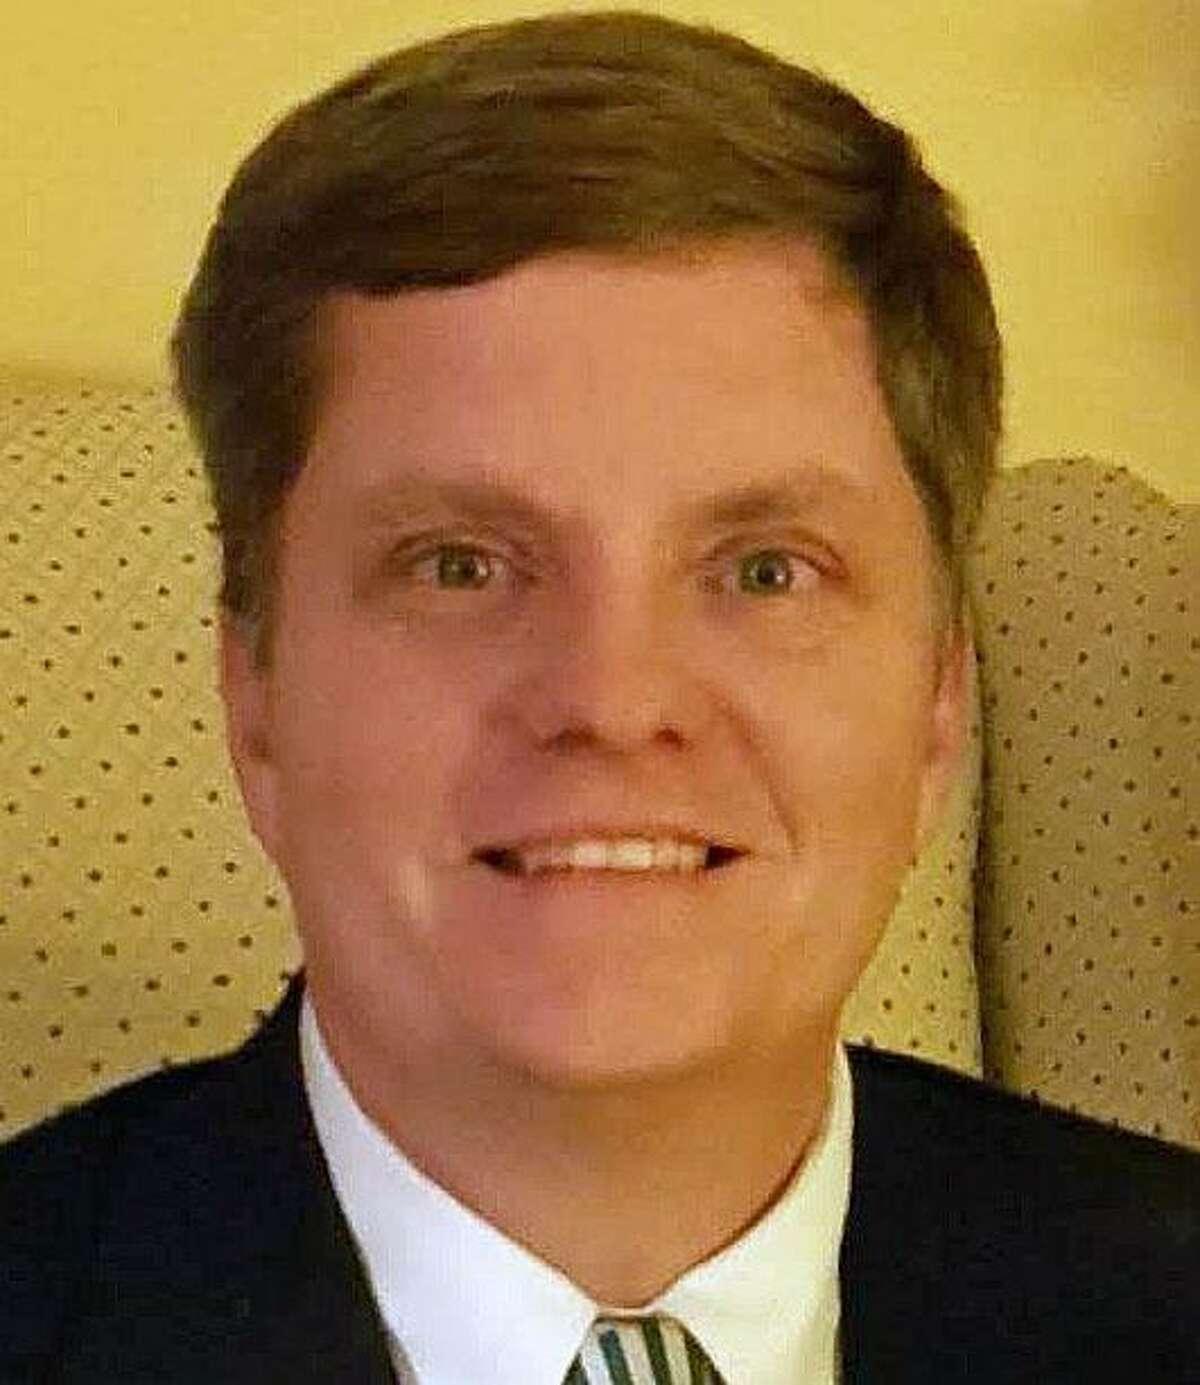 Andrew Clure